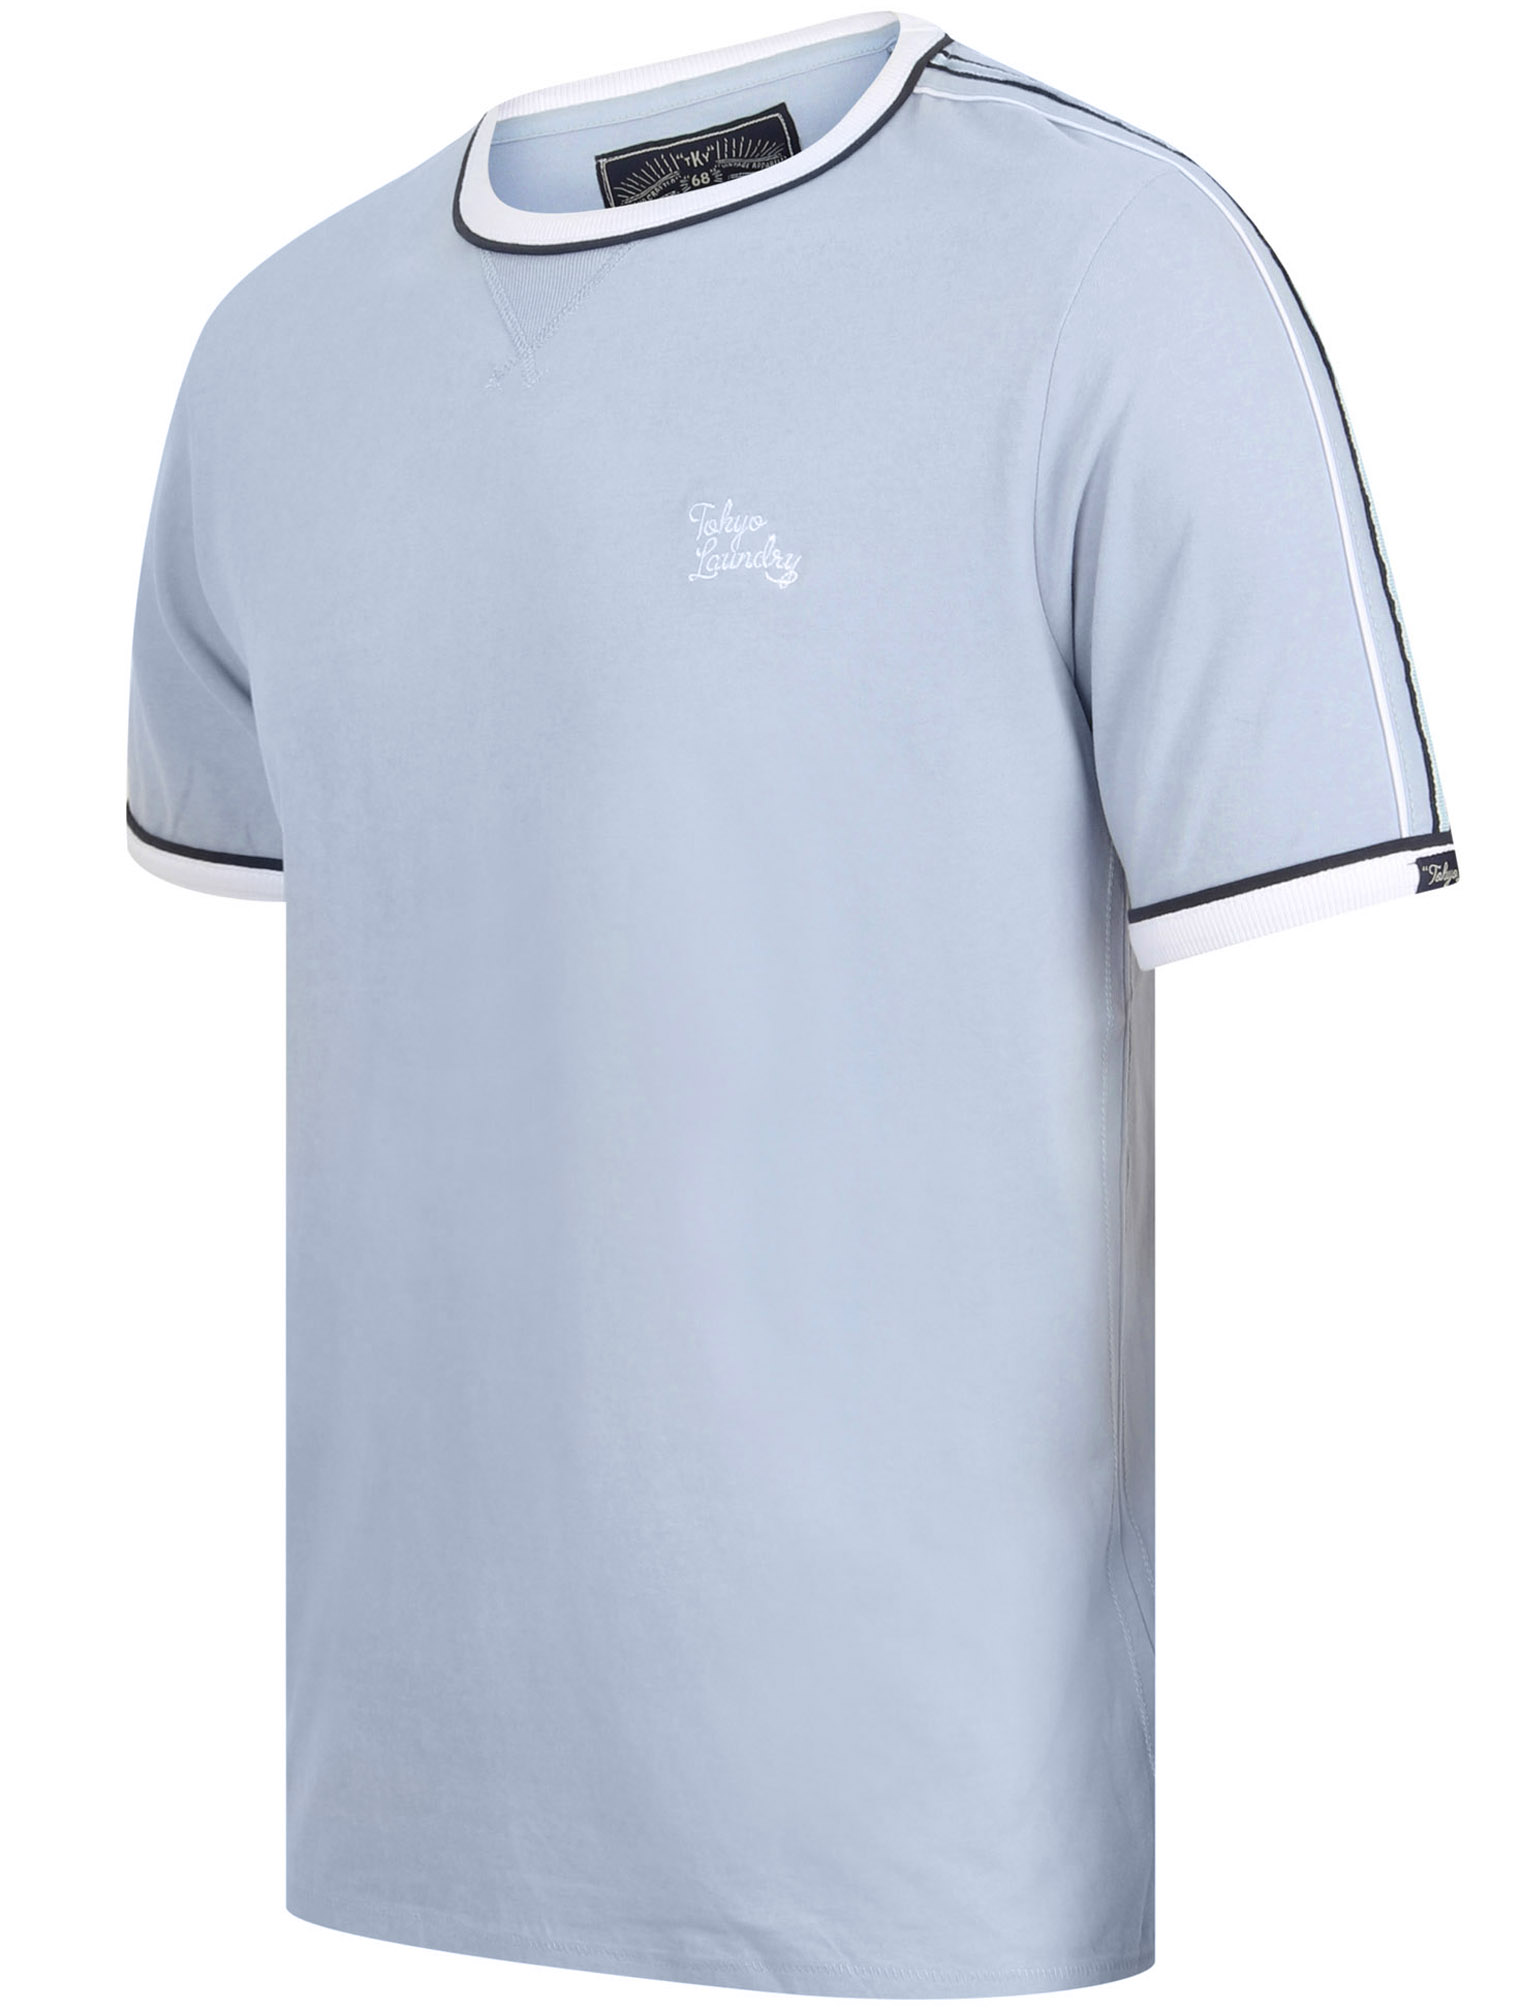 New-Mens-Tokyo-Laundry-Huson-Contrast-Crew-Neck-Cotton-Rich-T-Shirt-Size-S-XXL thumbnail 11